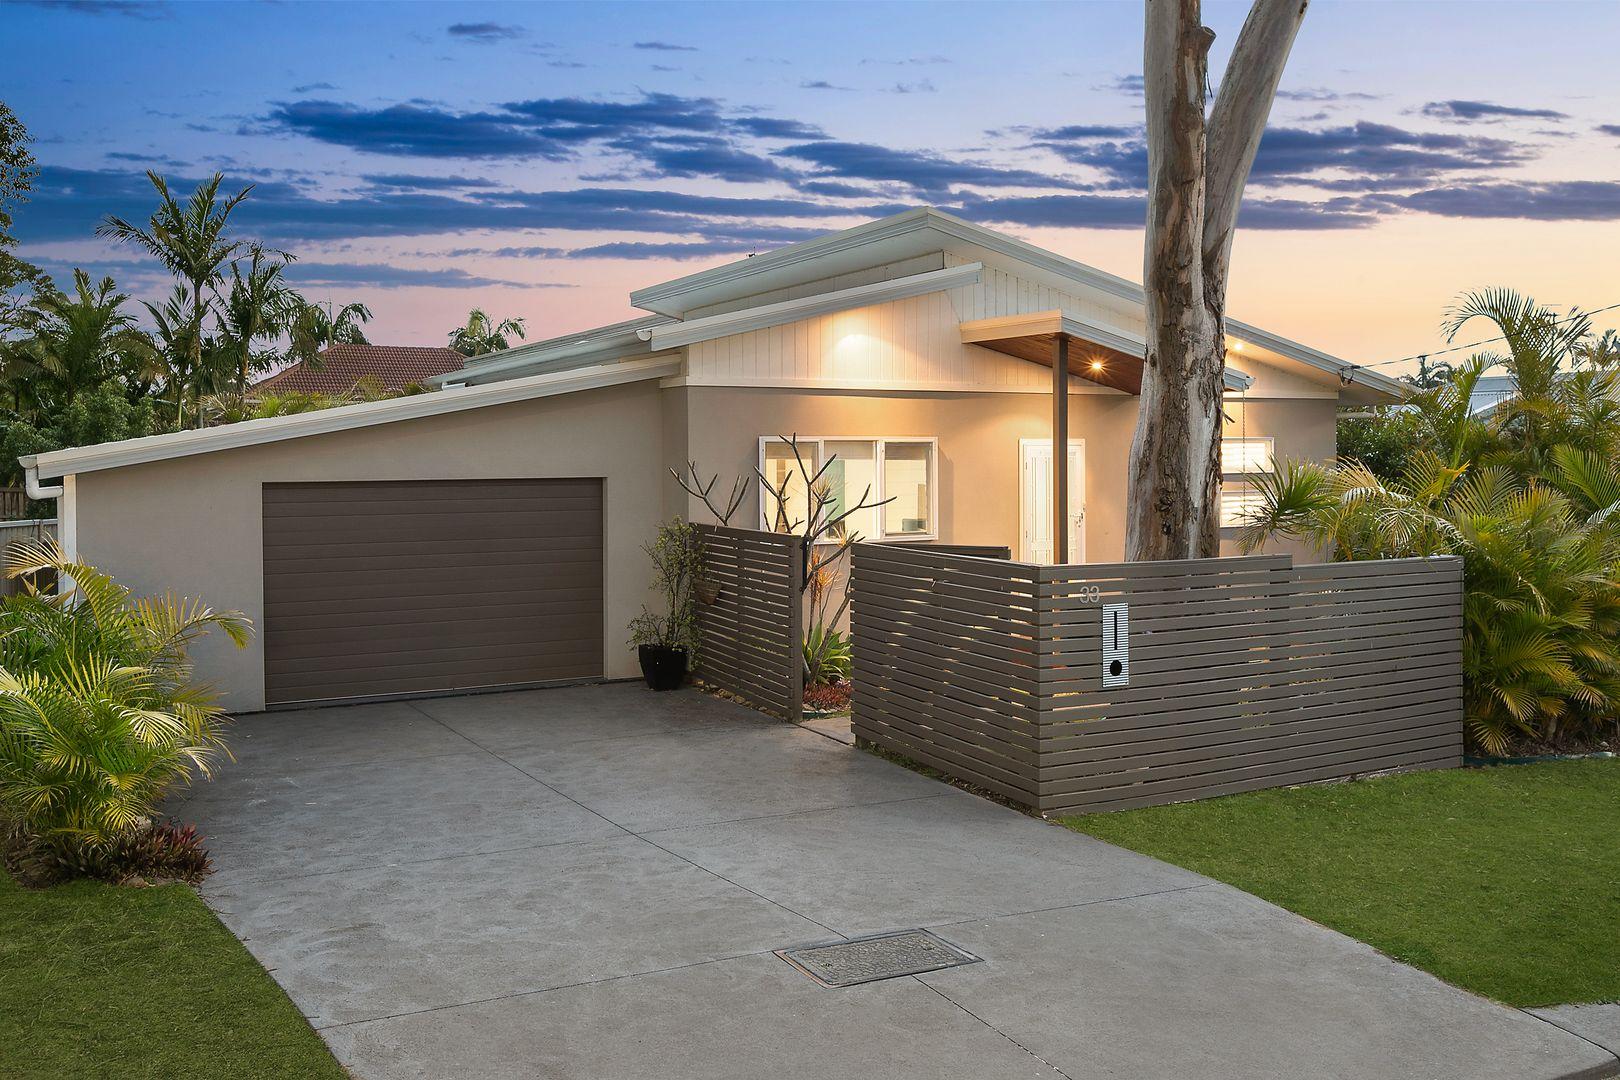 33 Phillip Street, Shelly Beach NSW 2261, Image 0